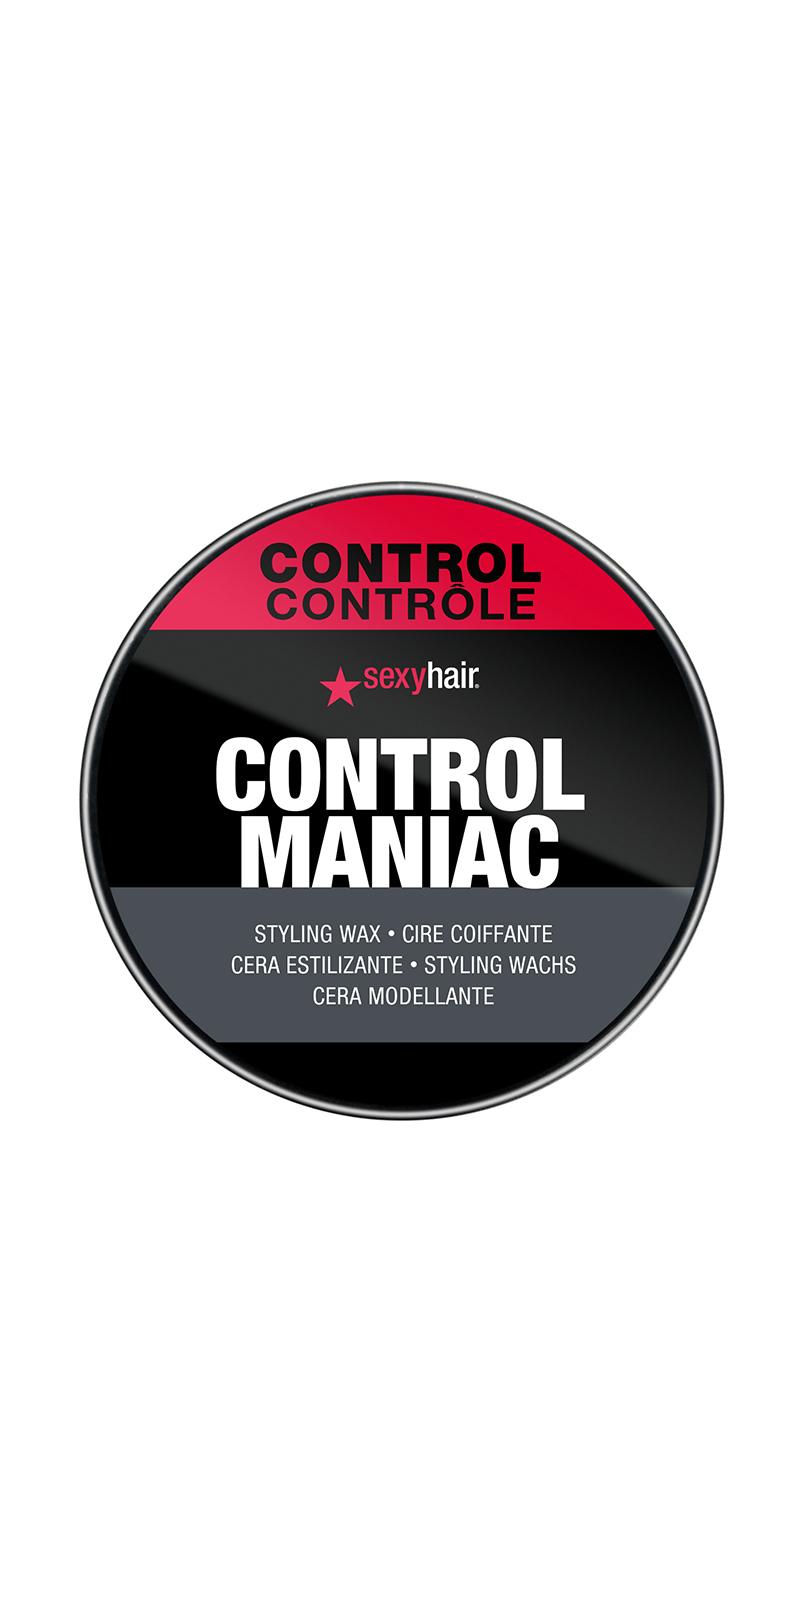 Z 200304 SH Style Control Maniac Top